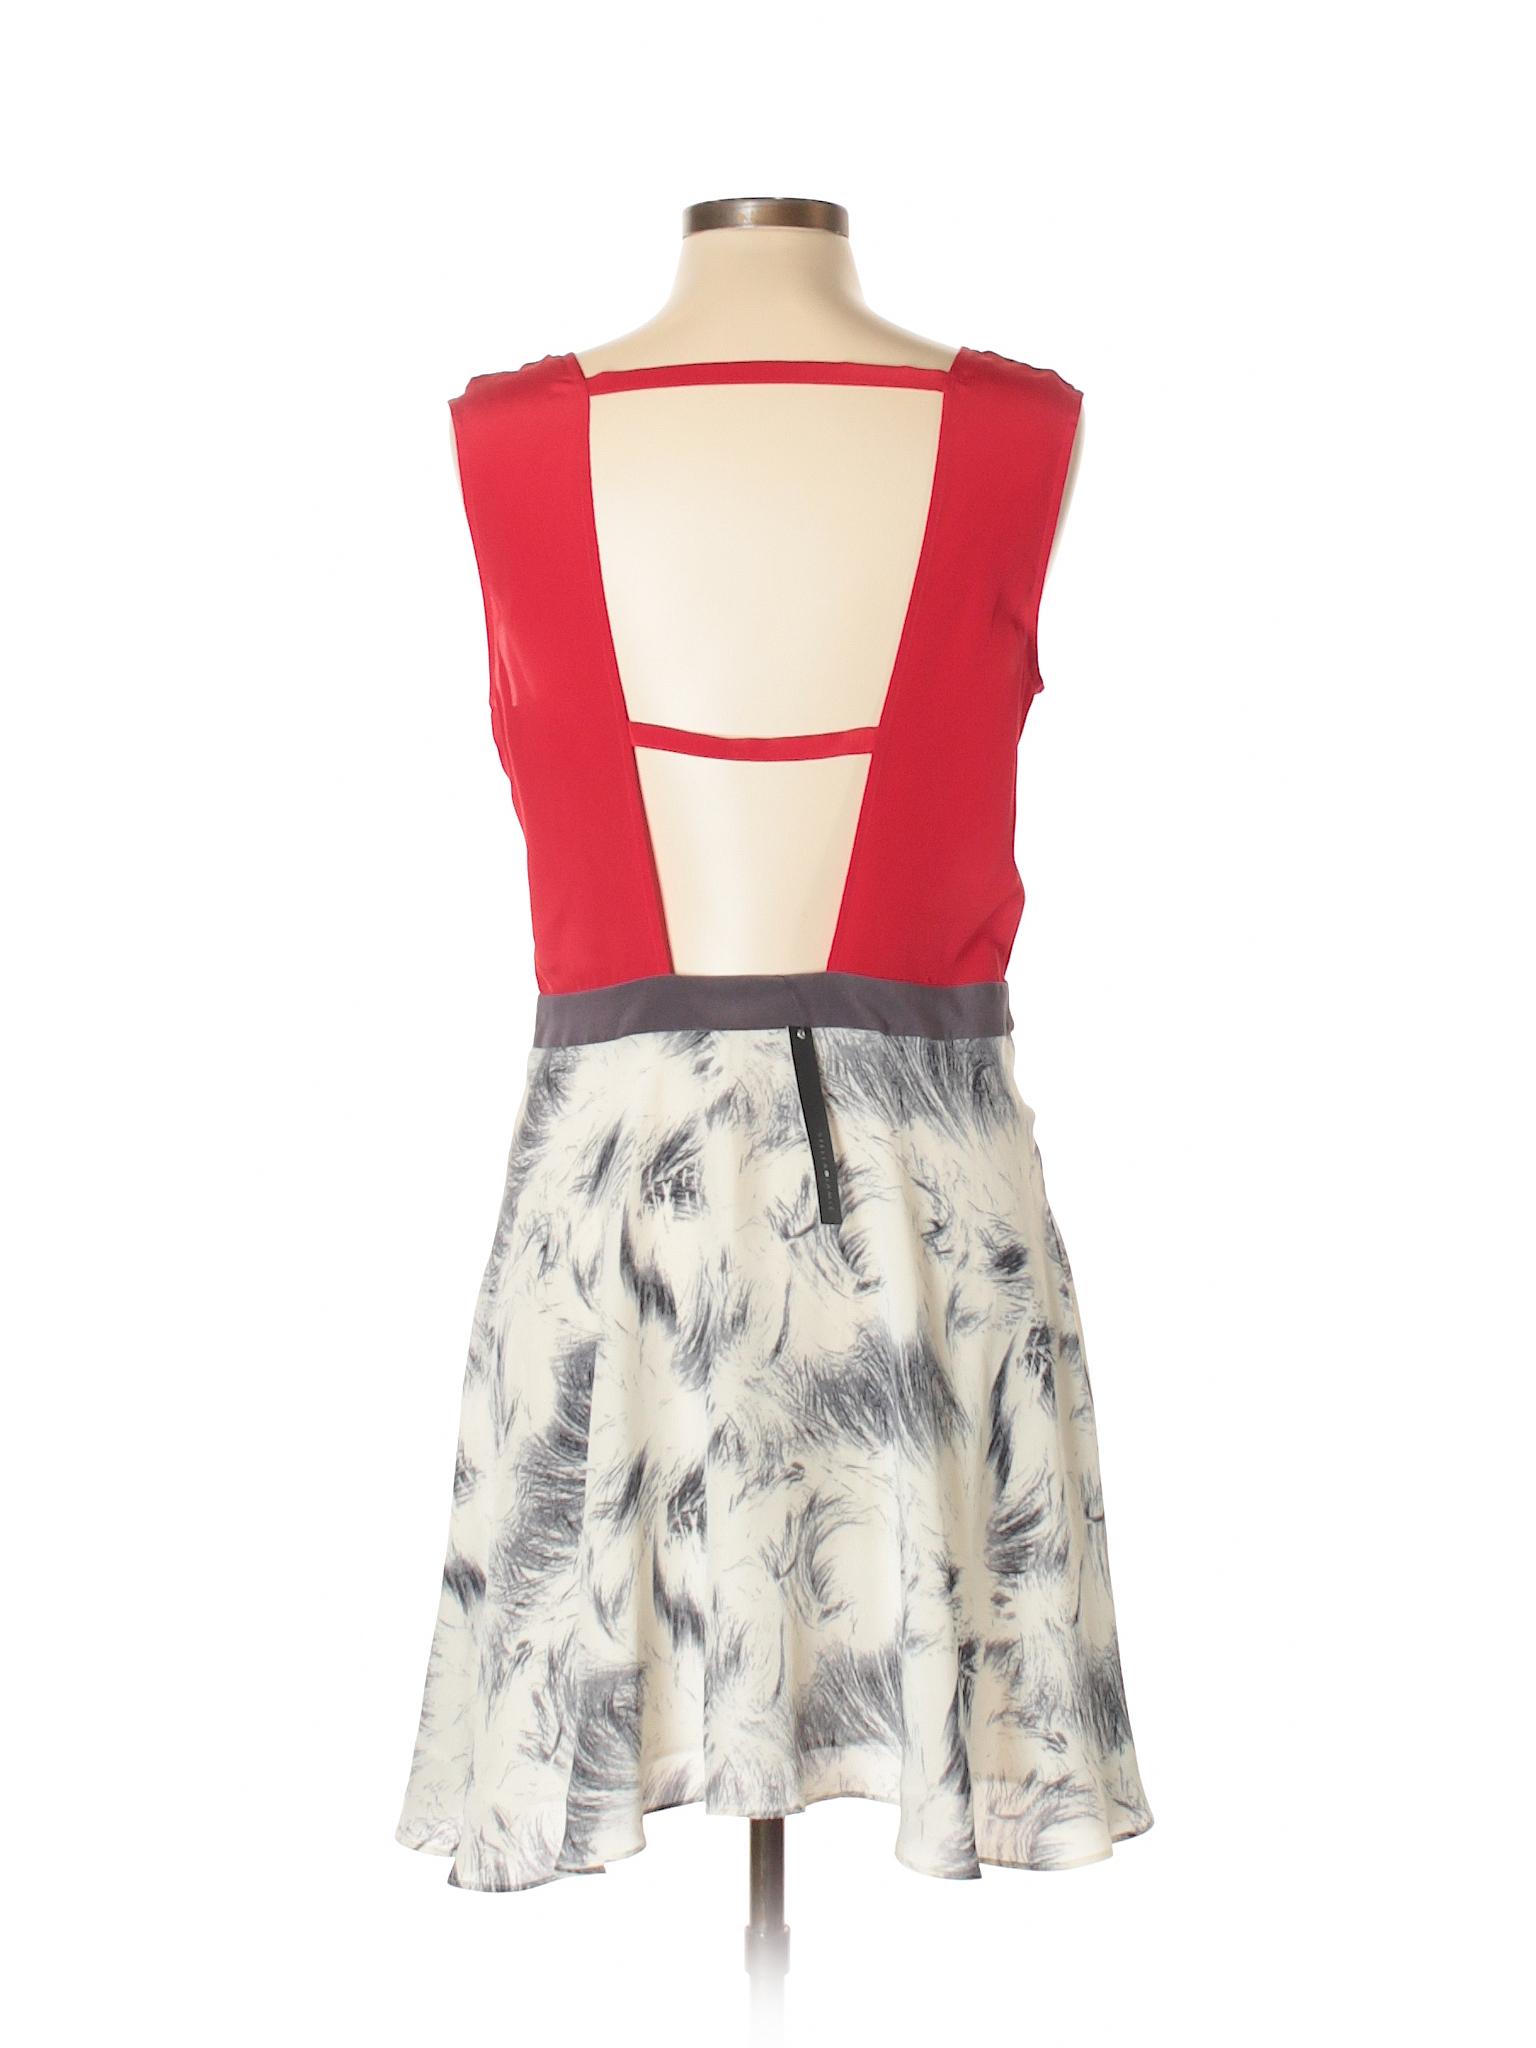 Casual Dress amp; Stella winter Jamie Boutique Iq8ZUZ